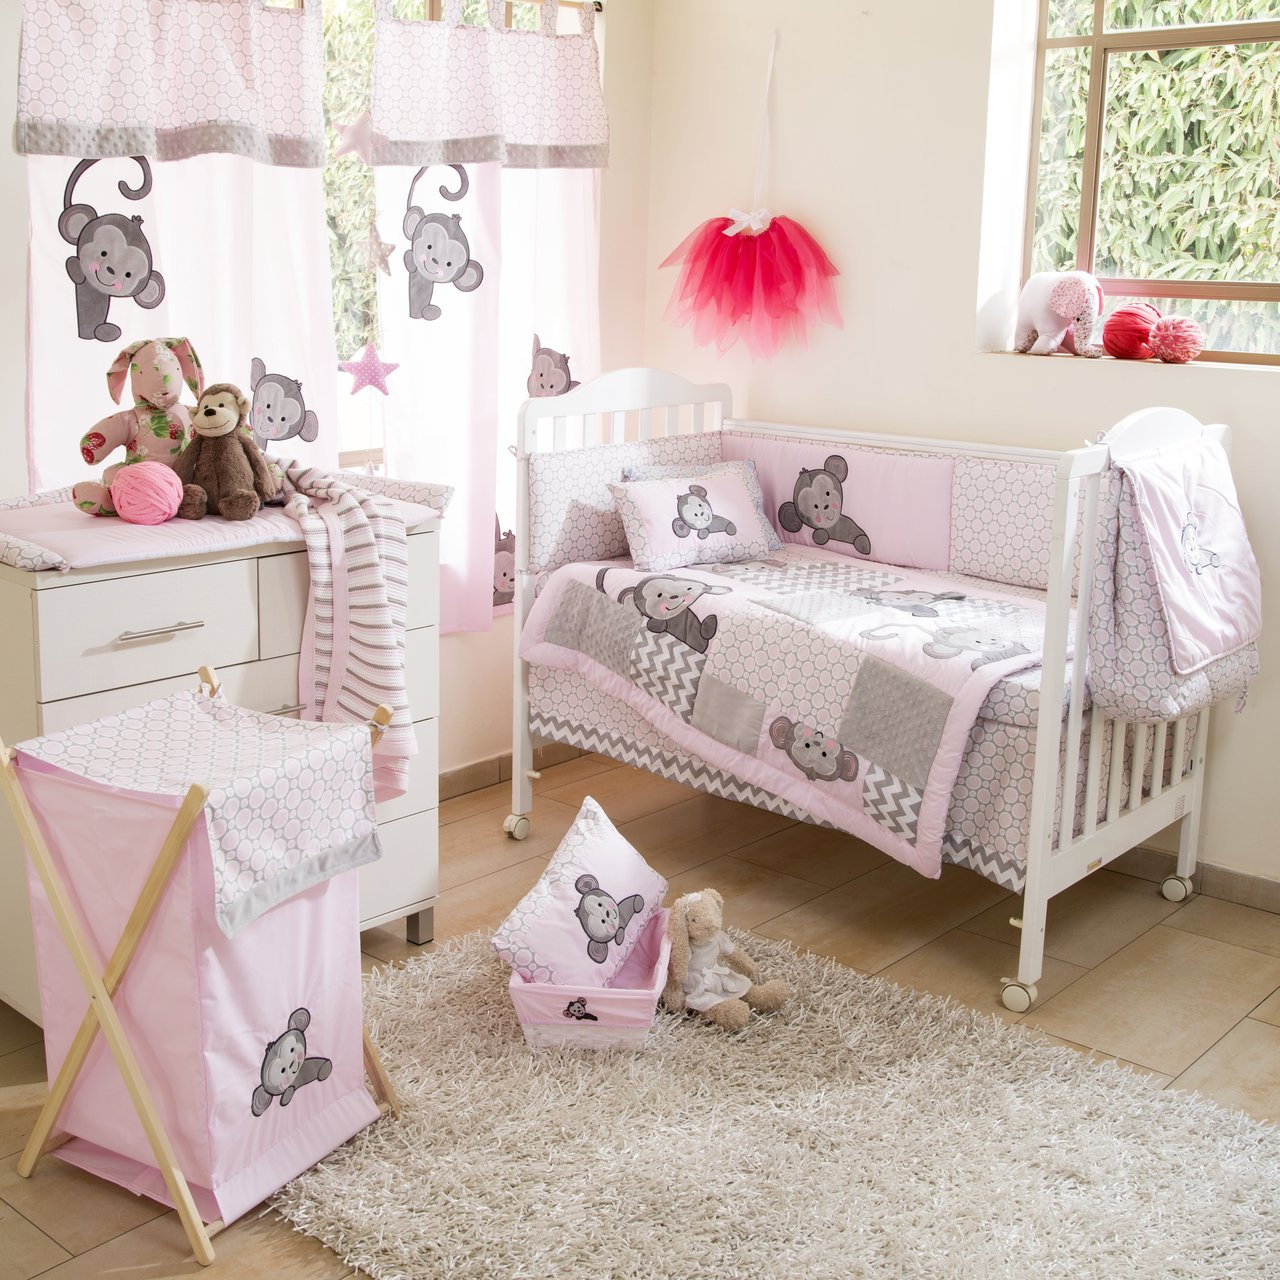 Pink Monkey Crib Bedding Set